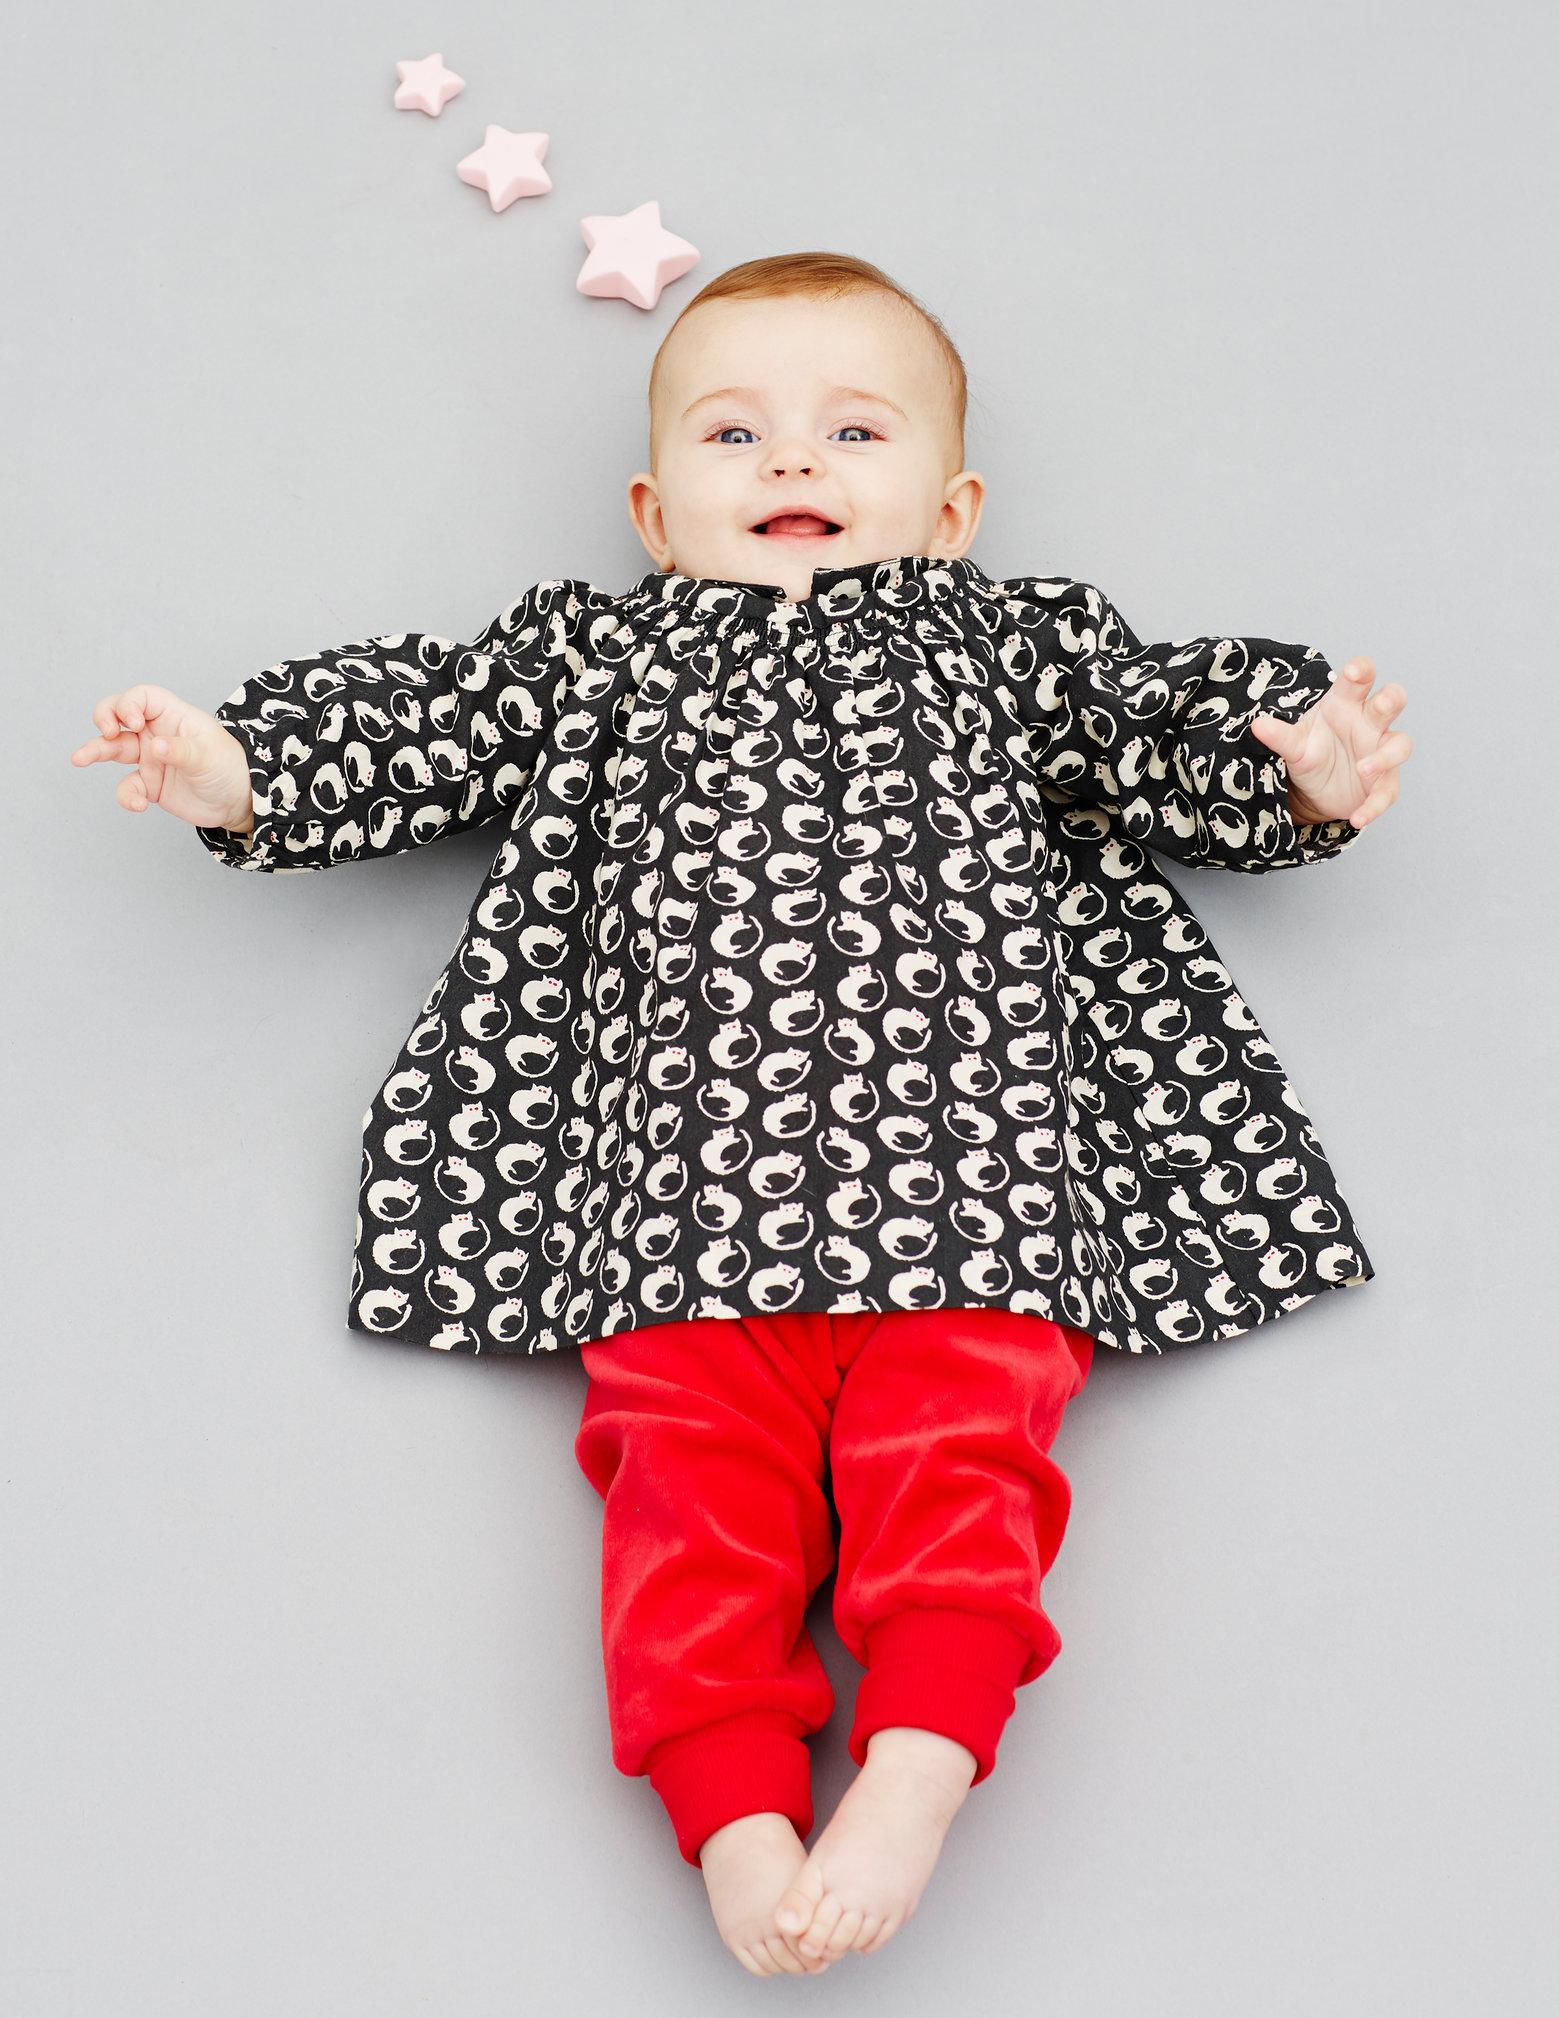 LittleLondon_Fashion_2411160811.jpg